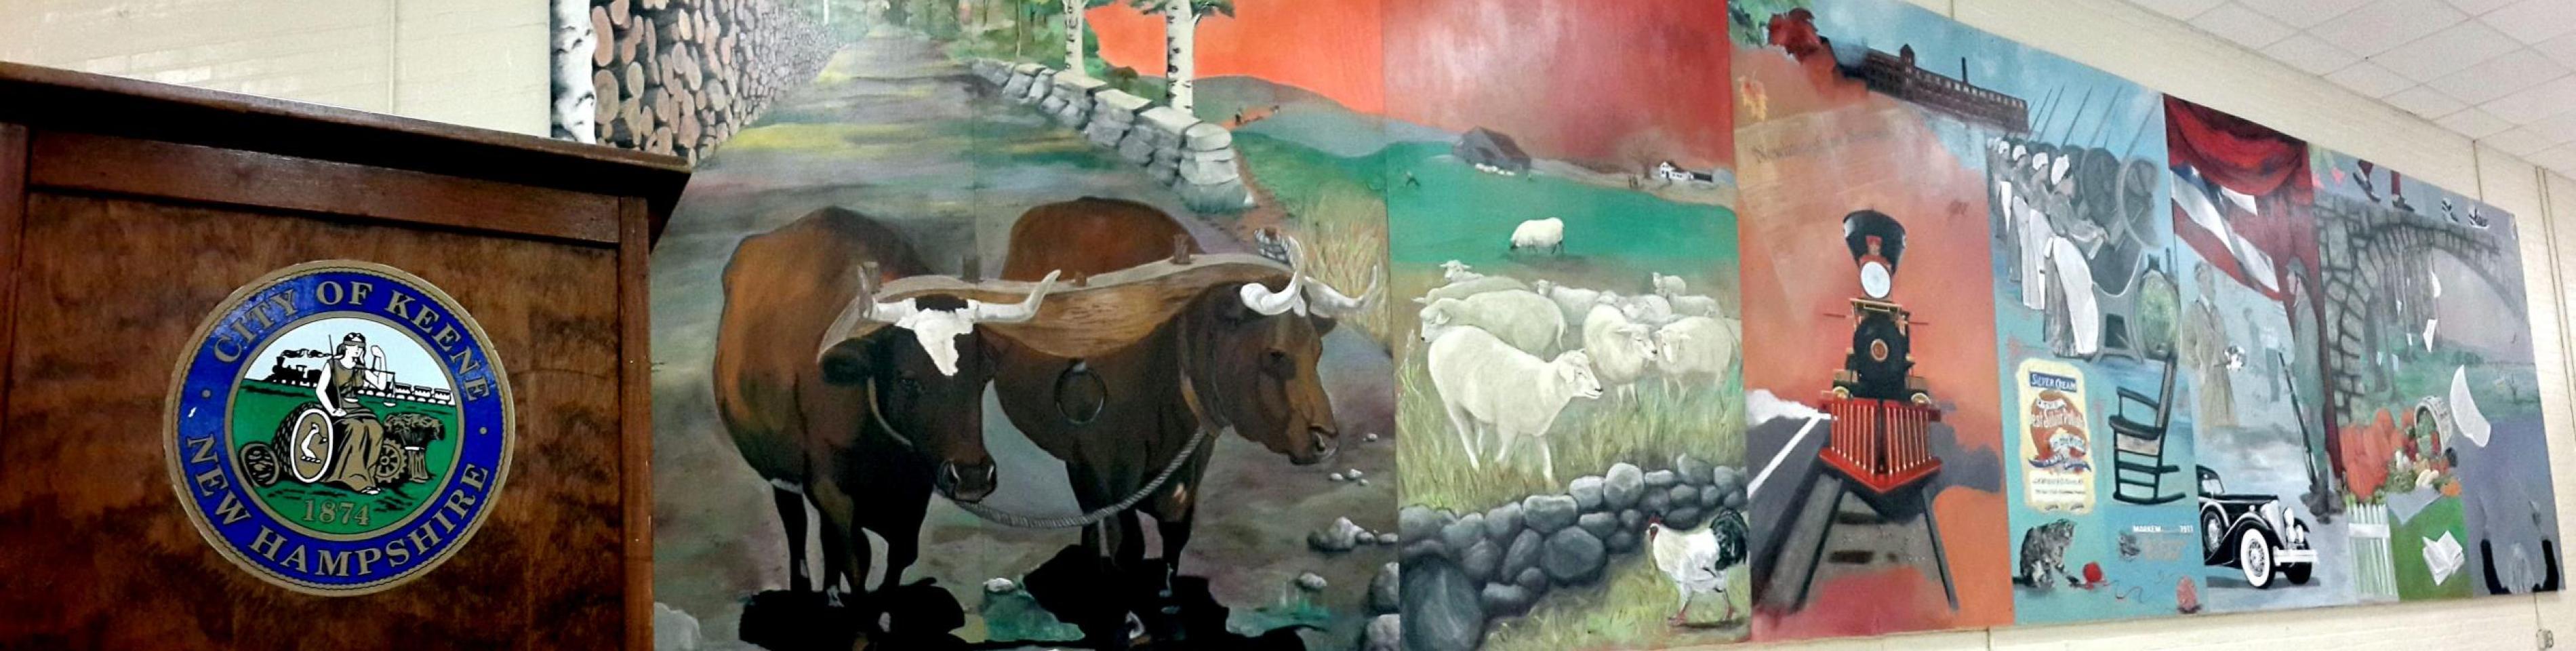 Recreation Center Mural